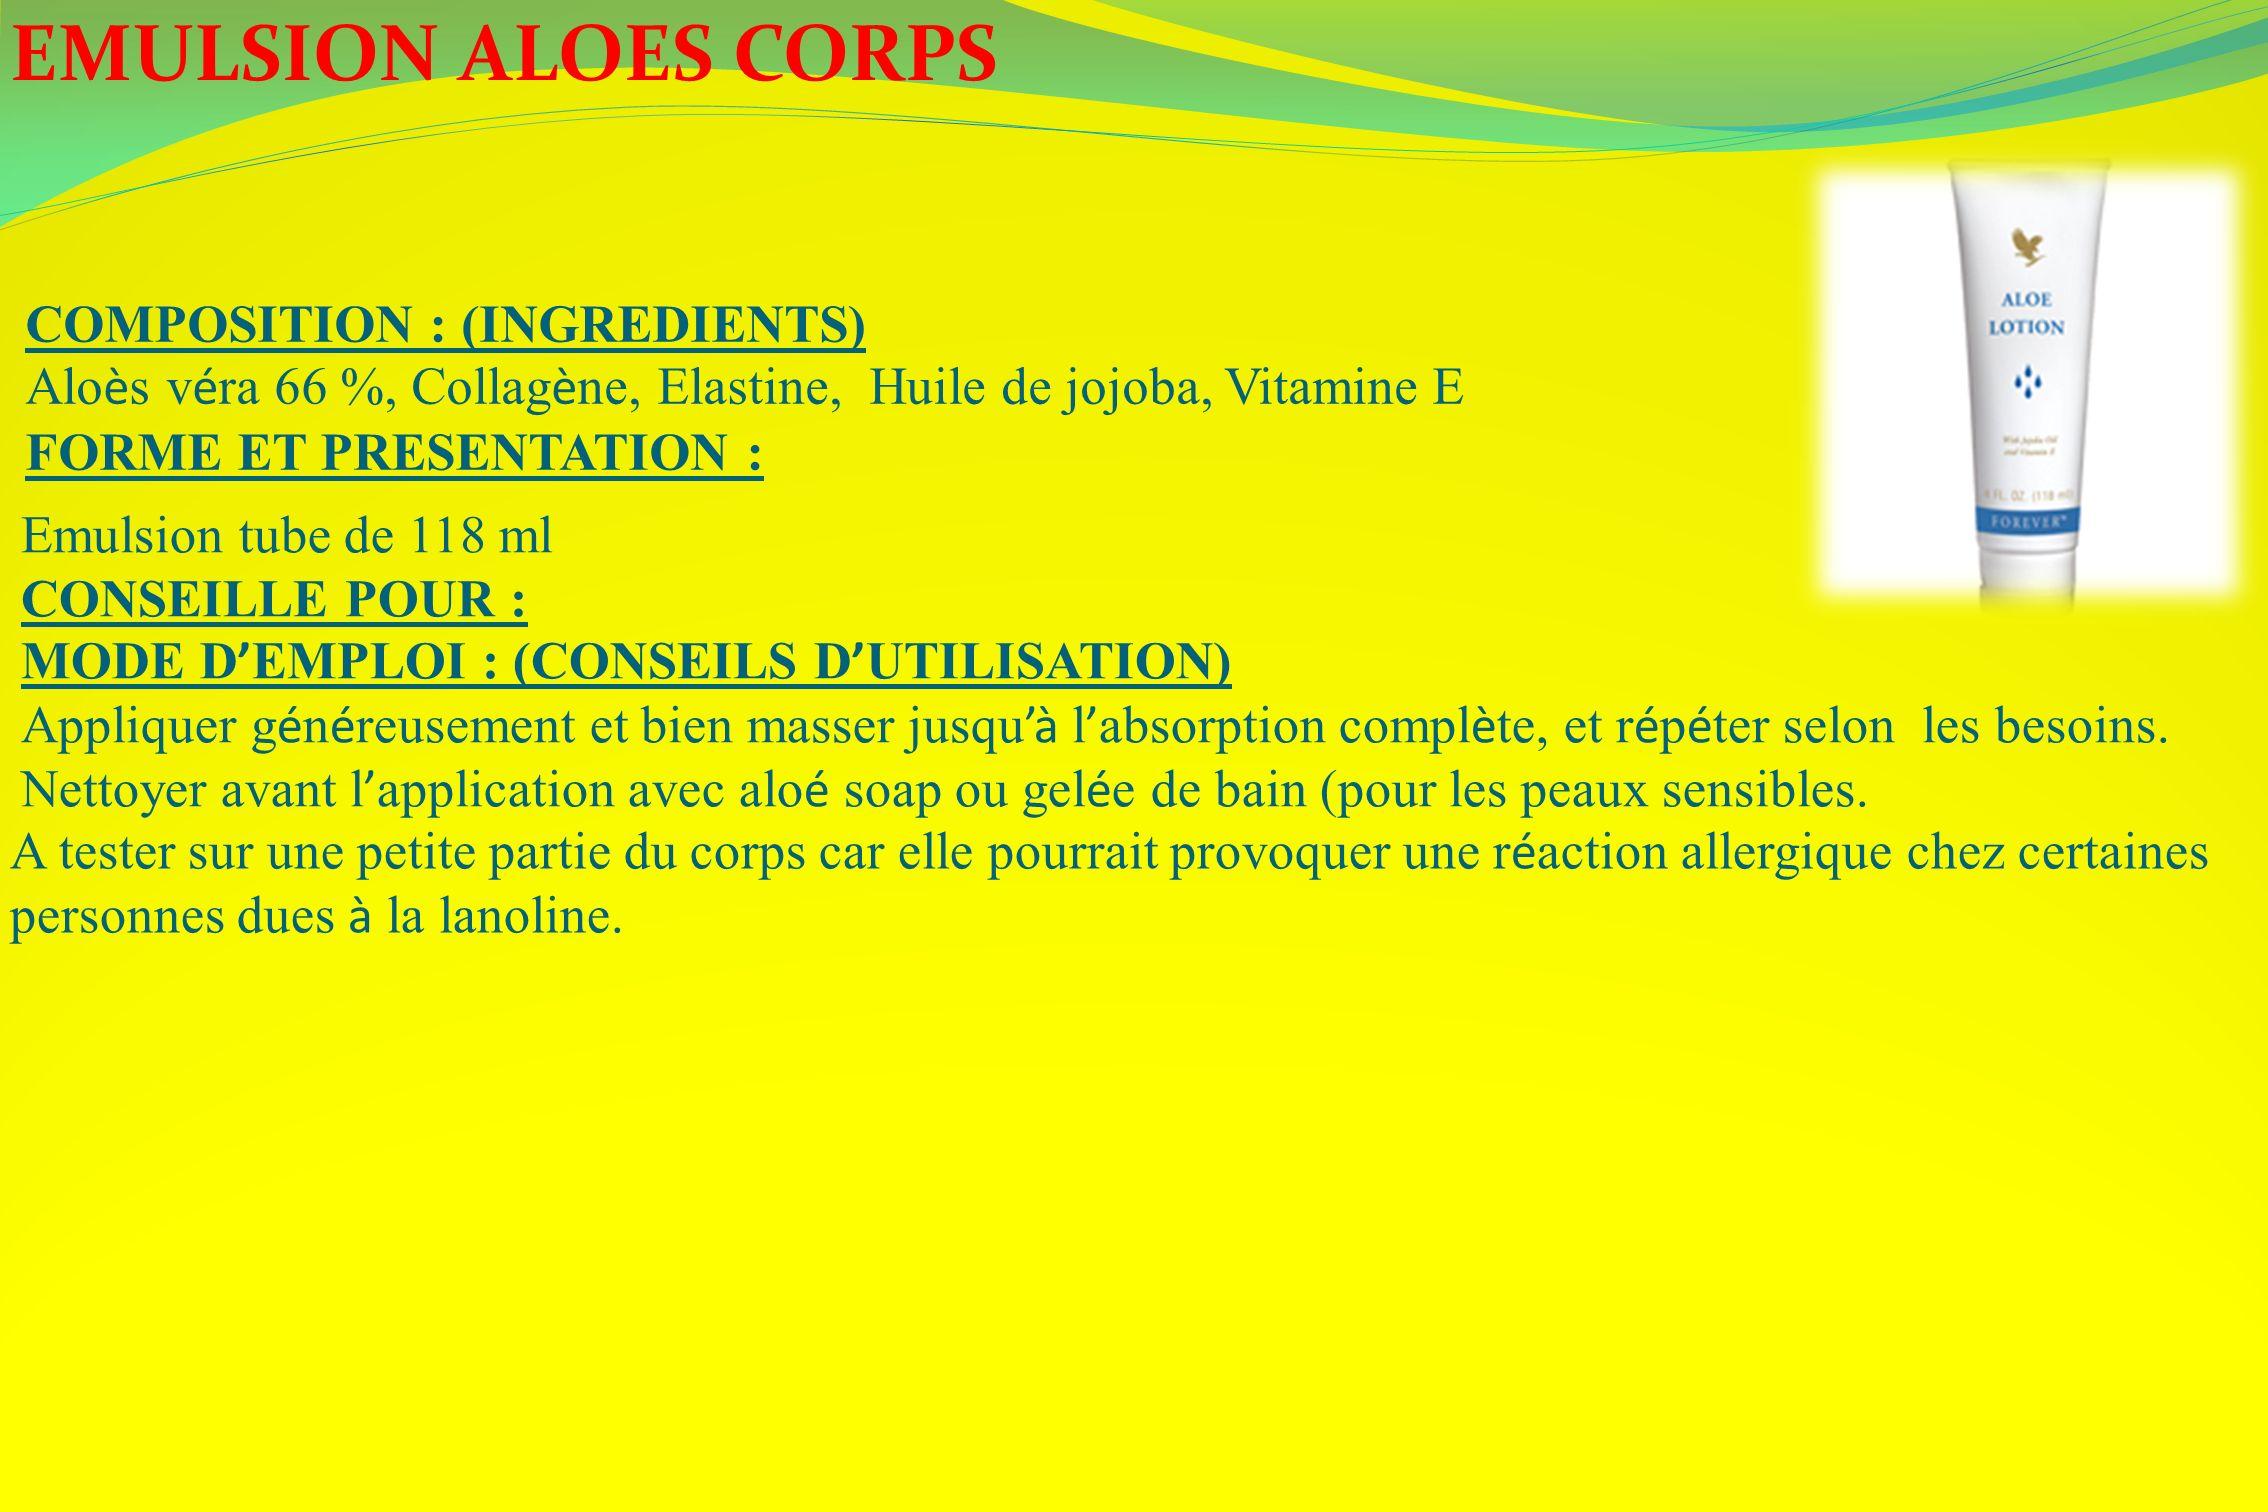 EMULSION ALOES CORPS COMPOSITION : (INGREDIENTS) Alo è s v é ra 66 %, Collag è ne, Elastine, Huile de jojoba, Vitamine E FORME ET PRESENTATION : Emuls